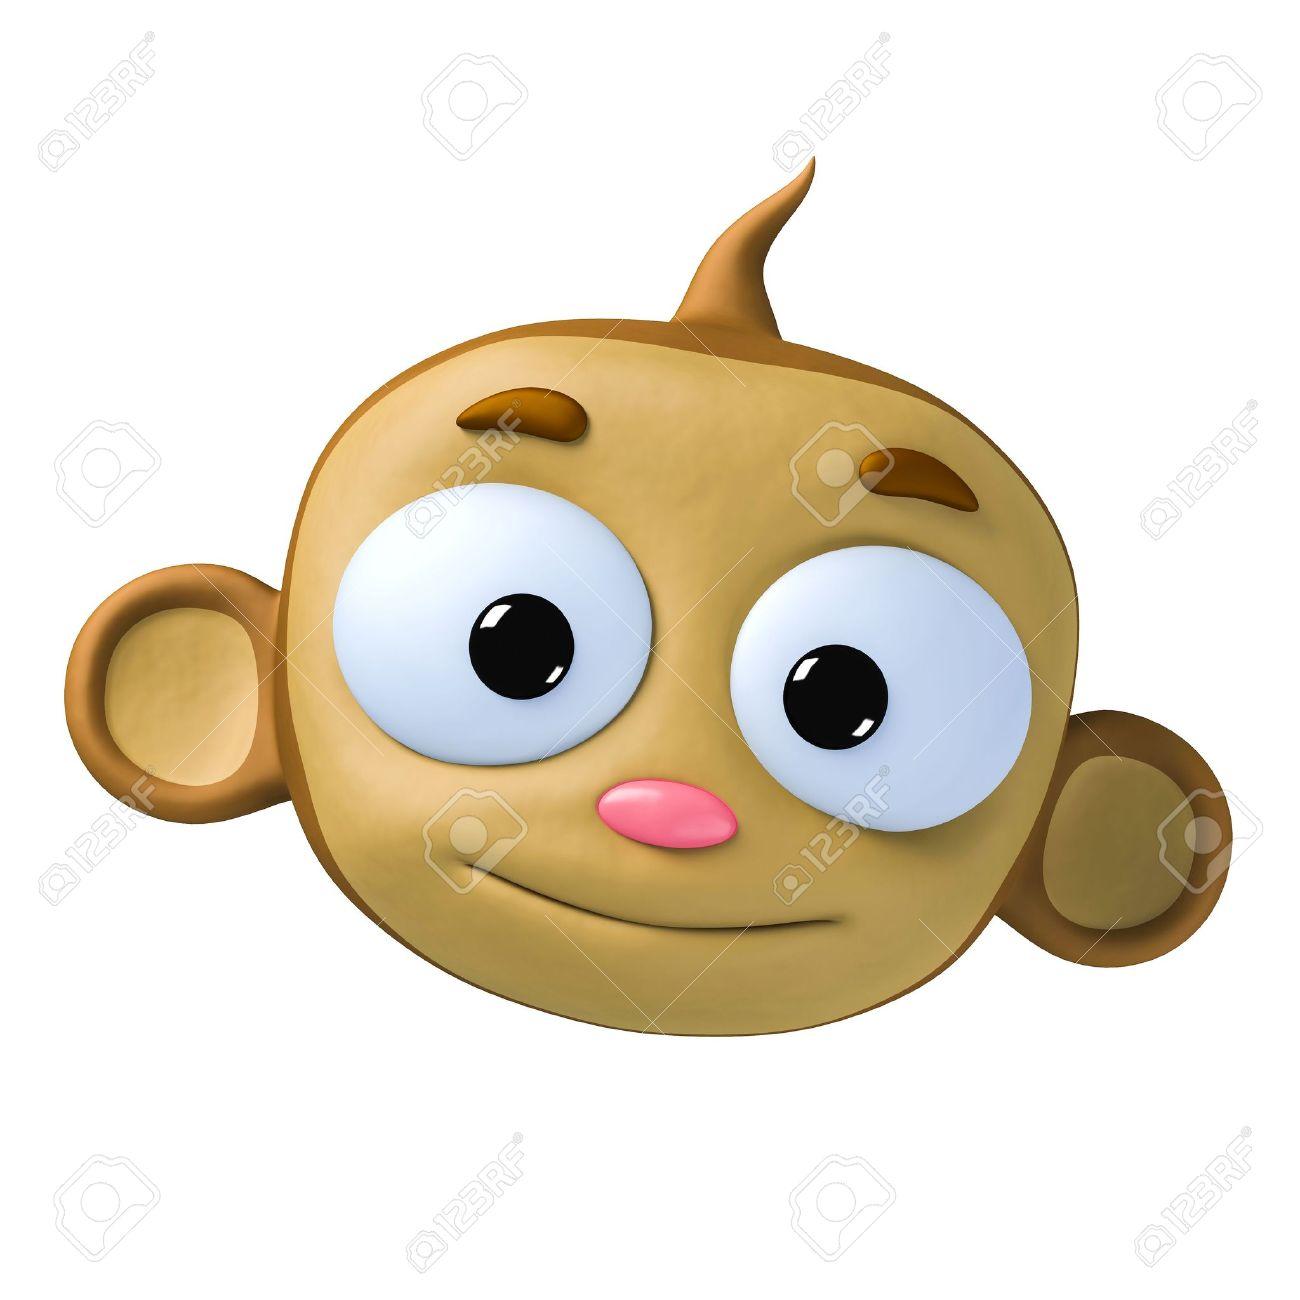 Silly Monkey Cartoon